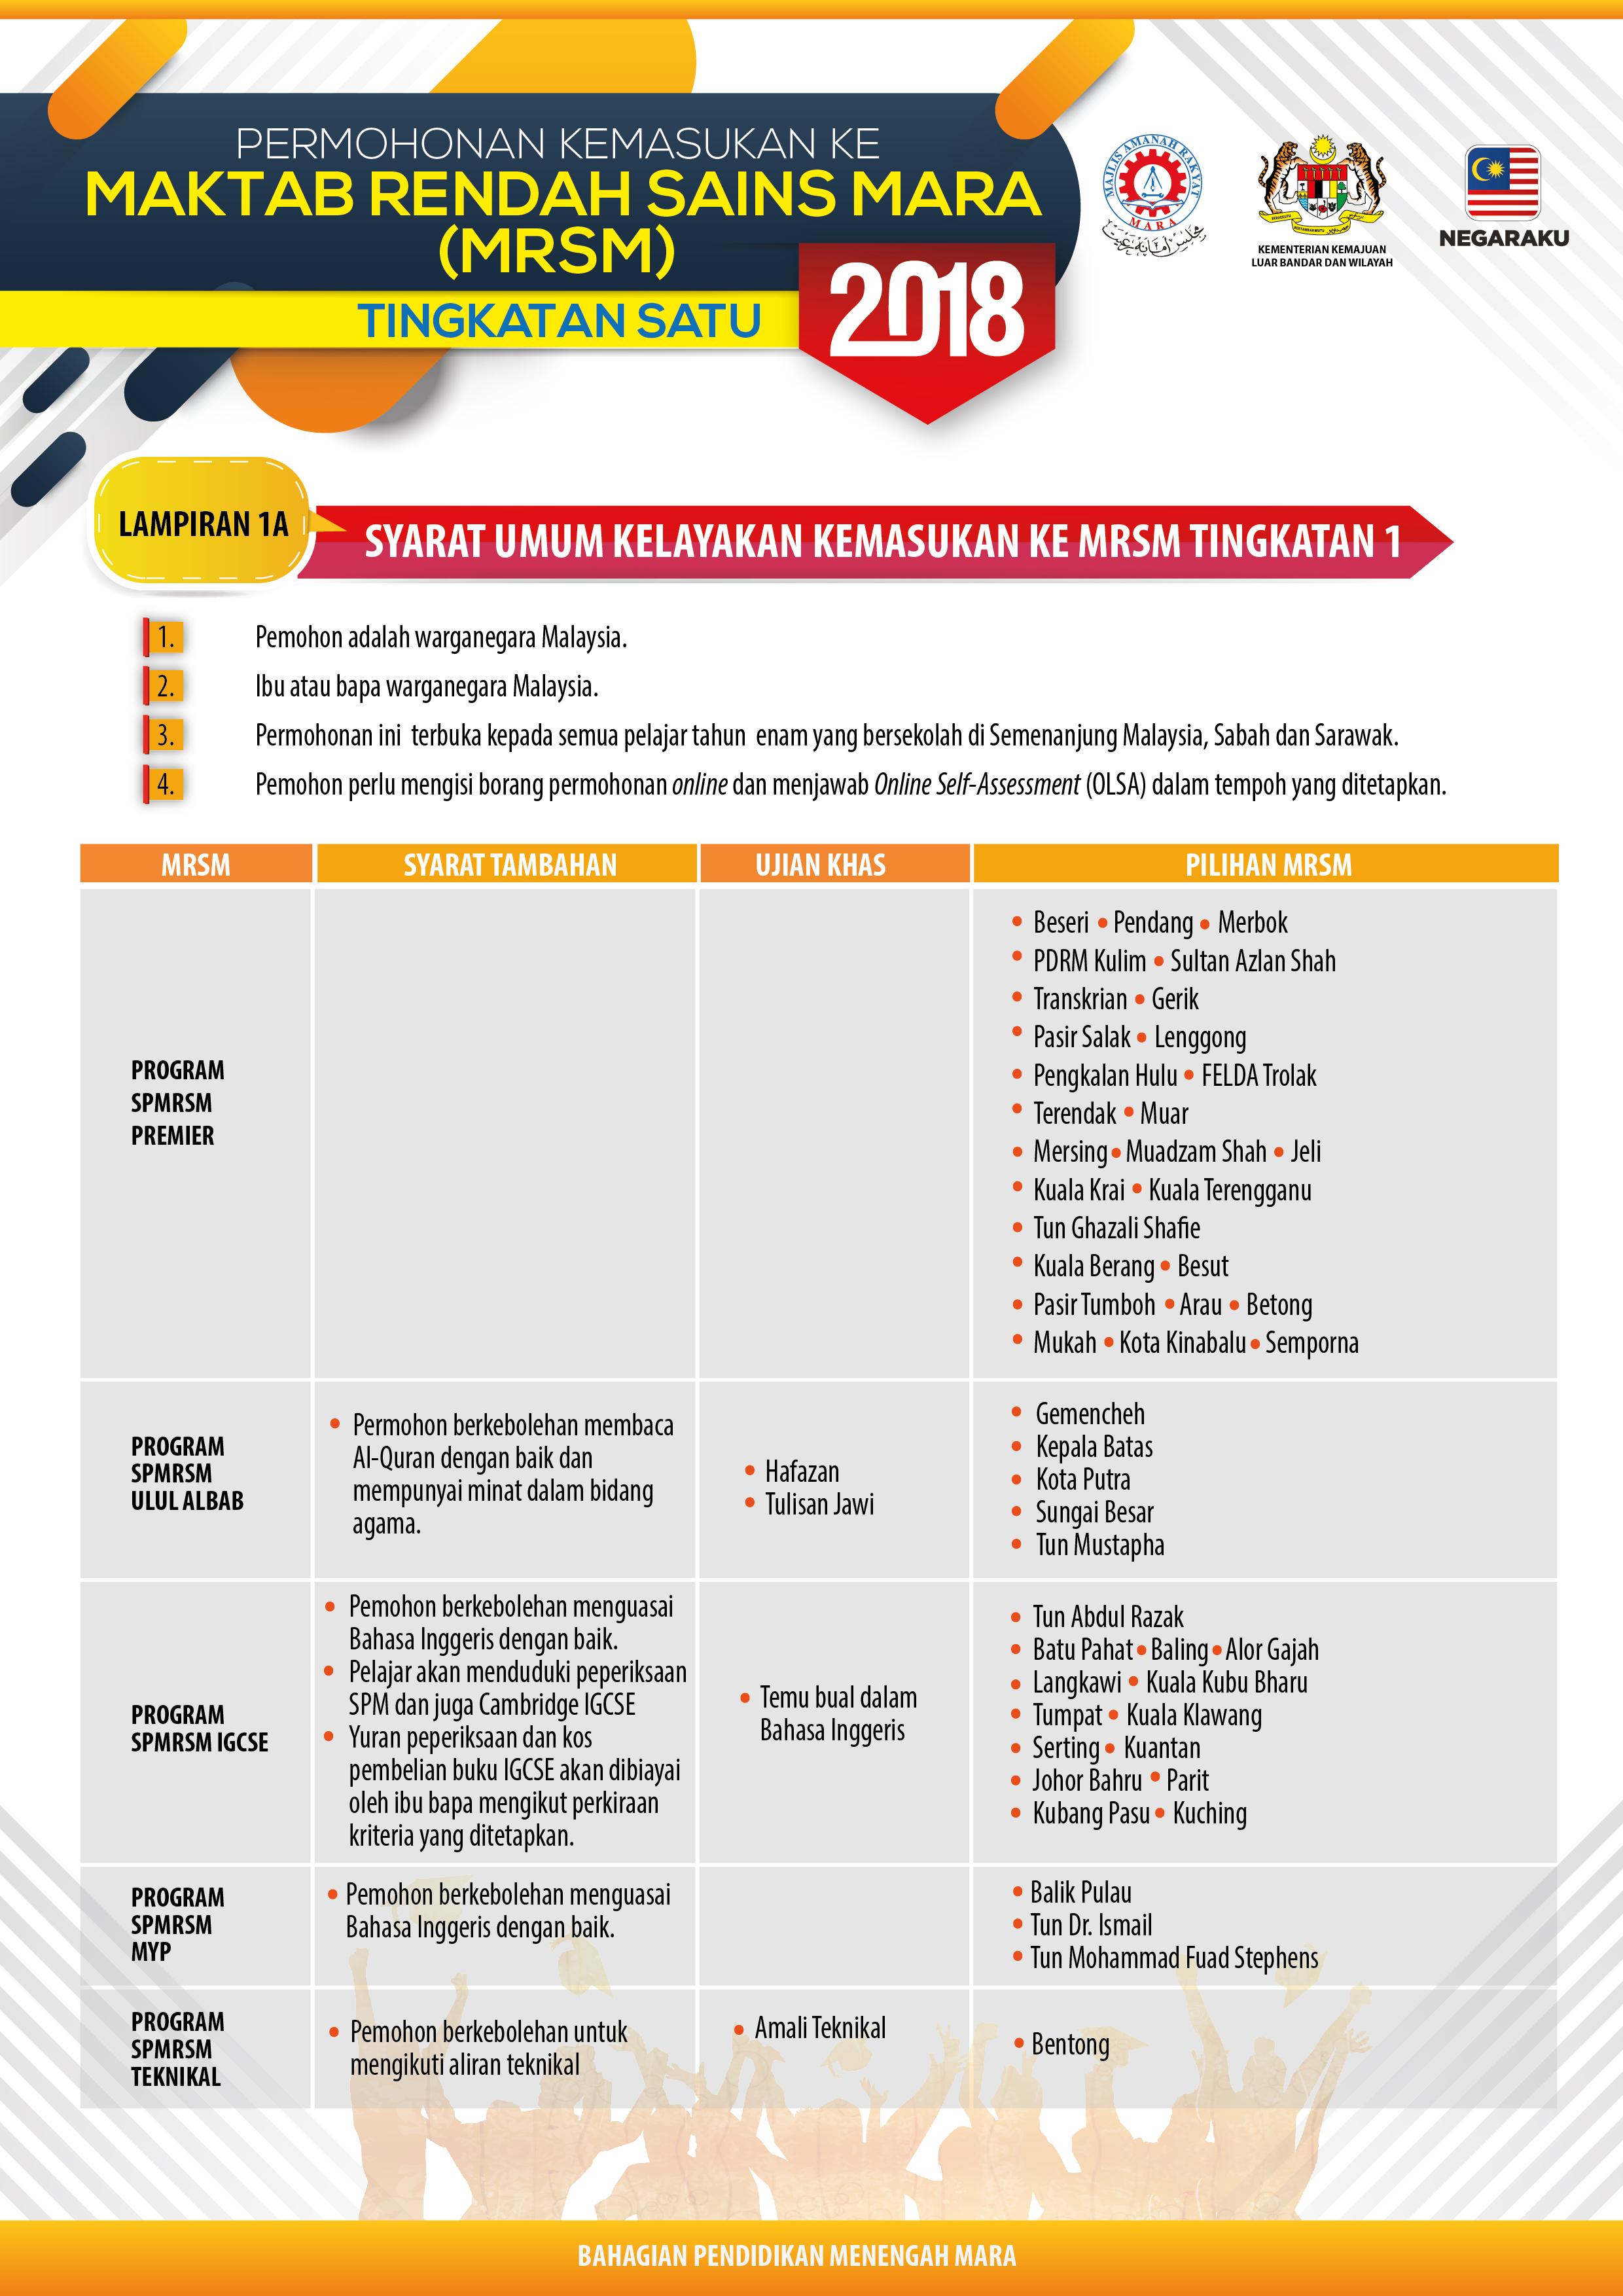 Permohonan MRSM Tingkatan 1 2018 - SAPS NKRA